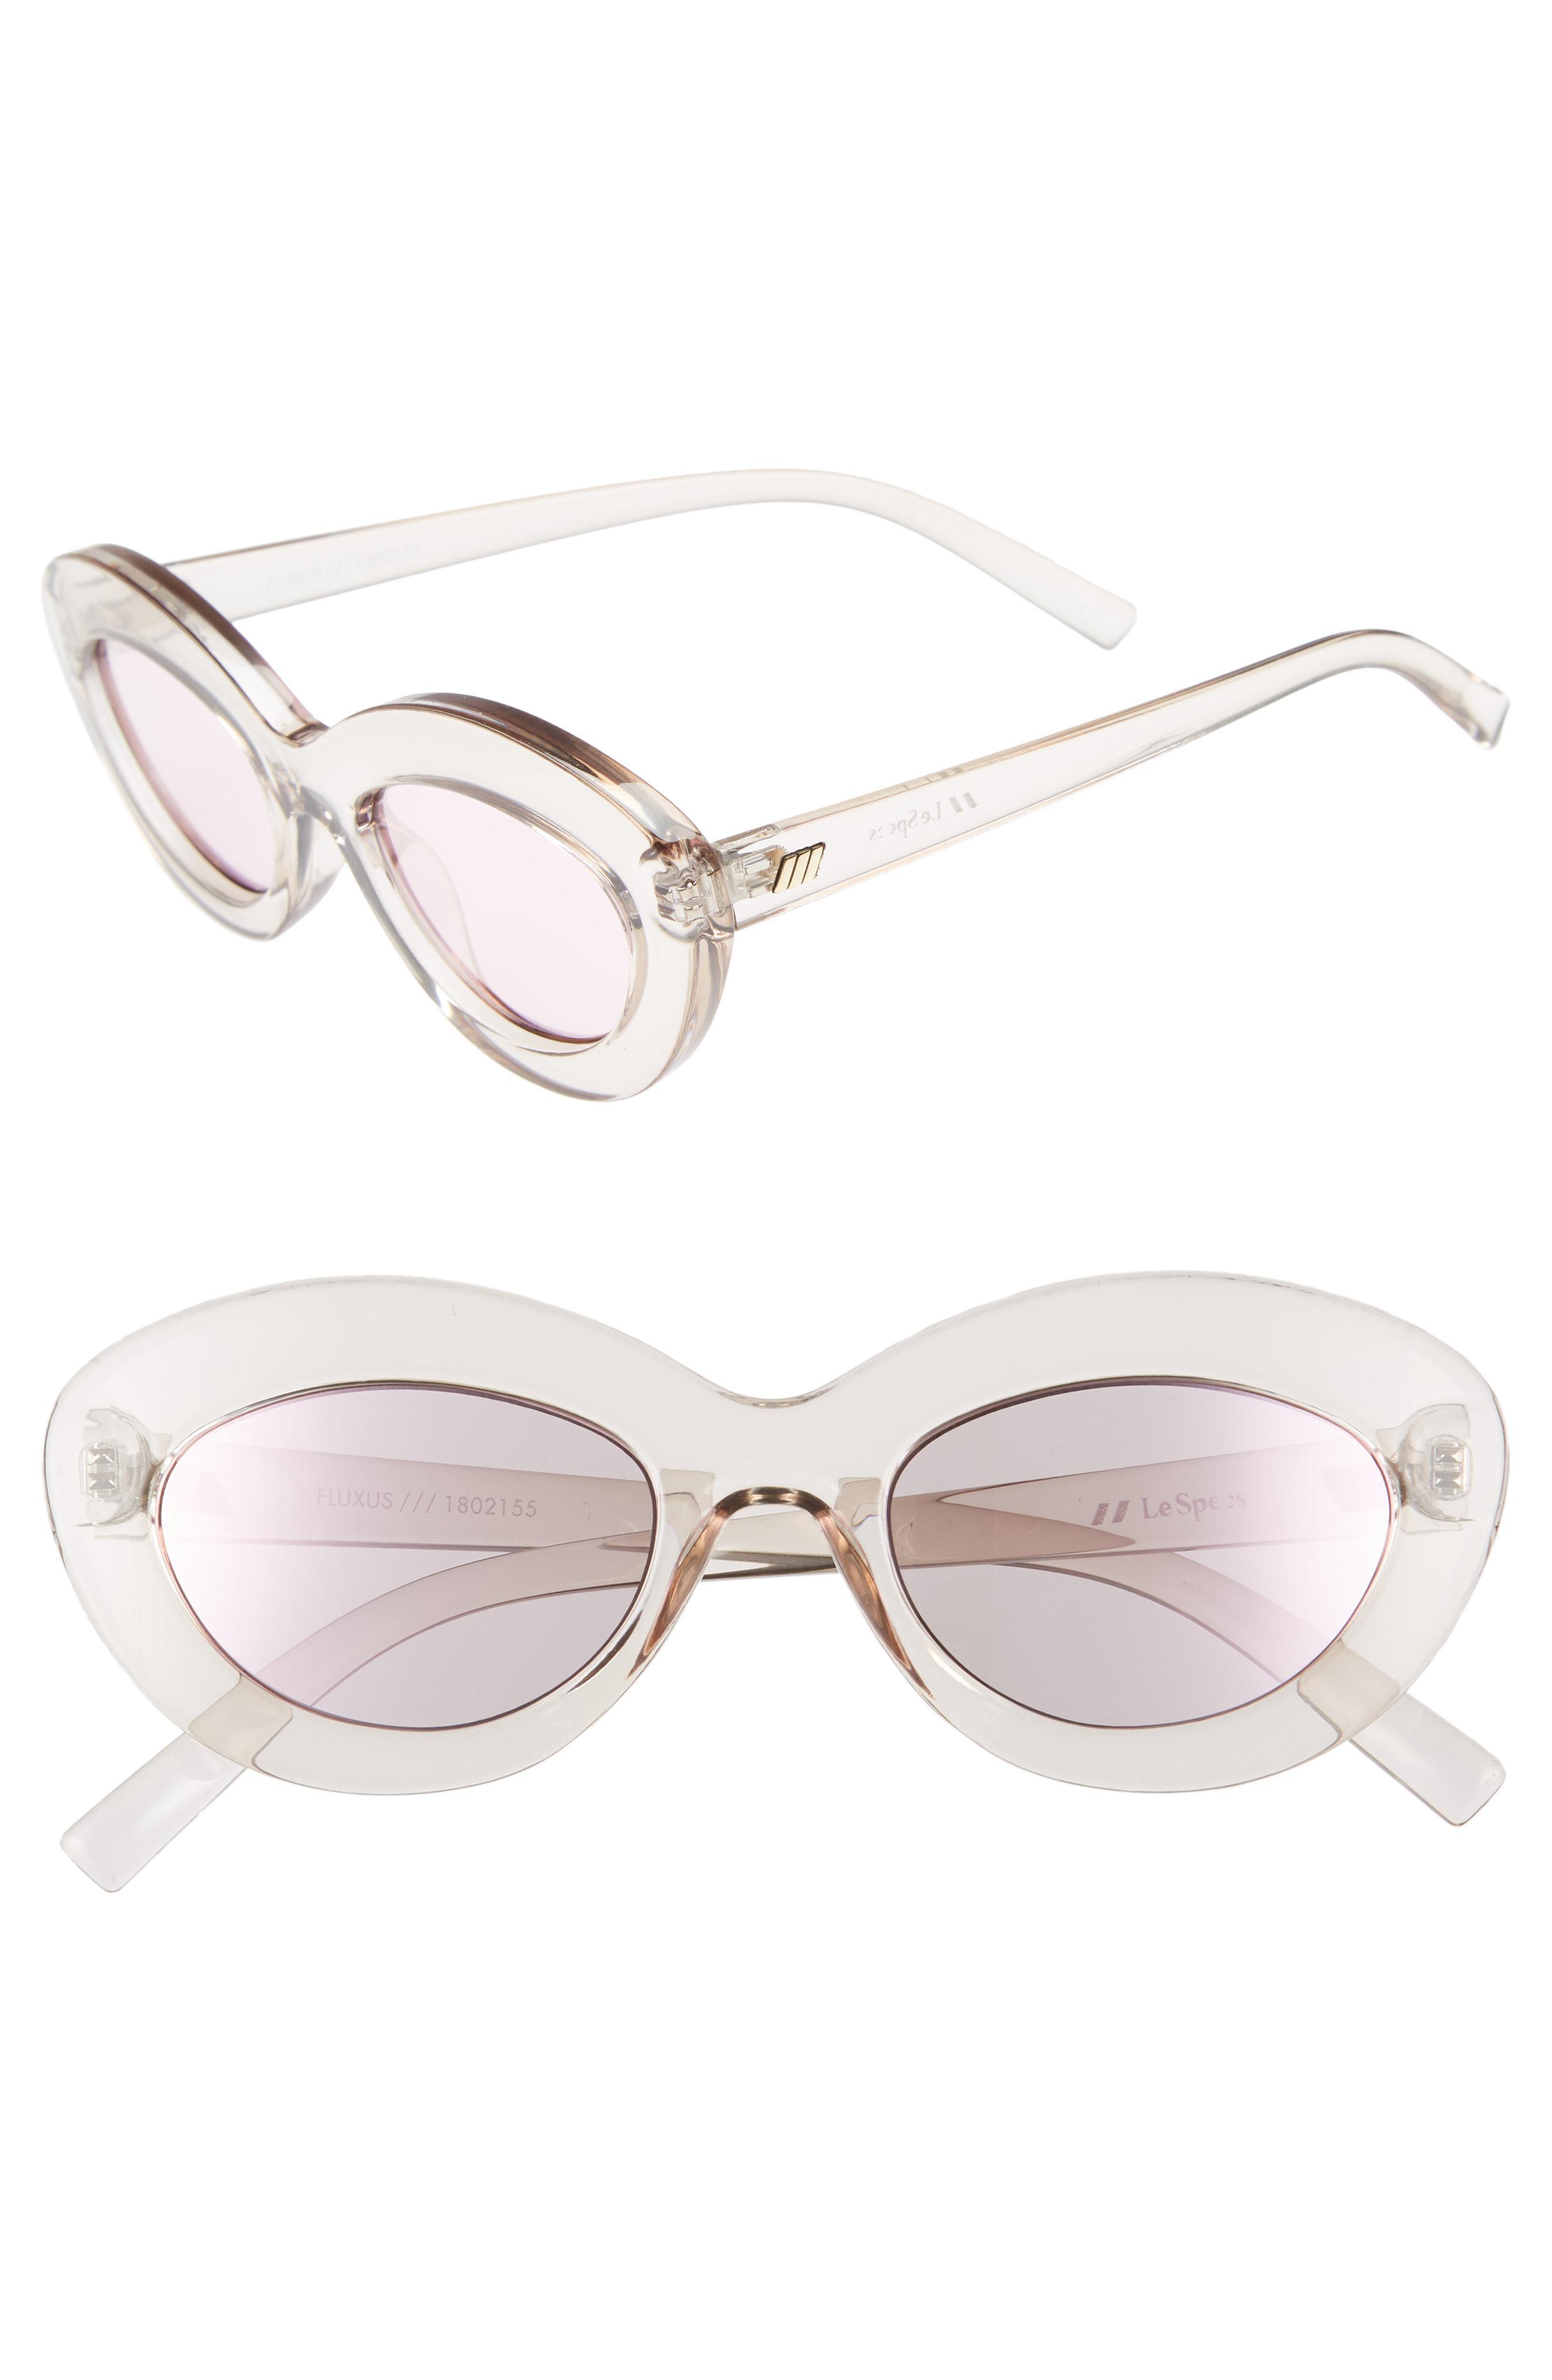 55d07958297 Lyst - Le Specs Fluxus 48mm Cat Eye Sunglasses in Pink